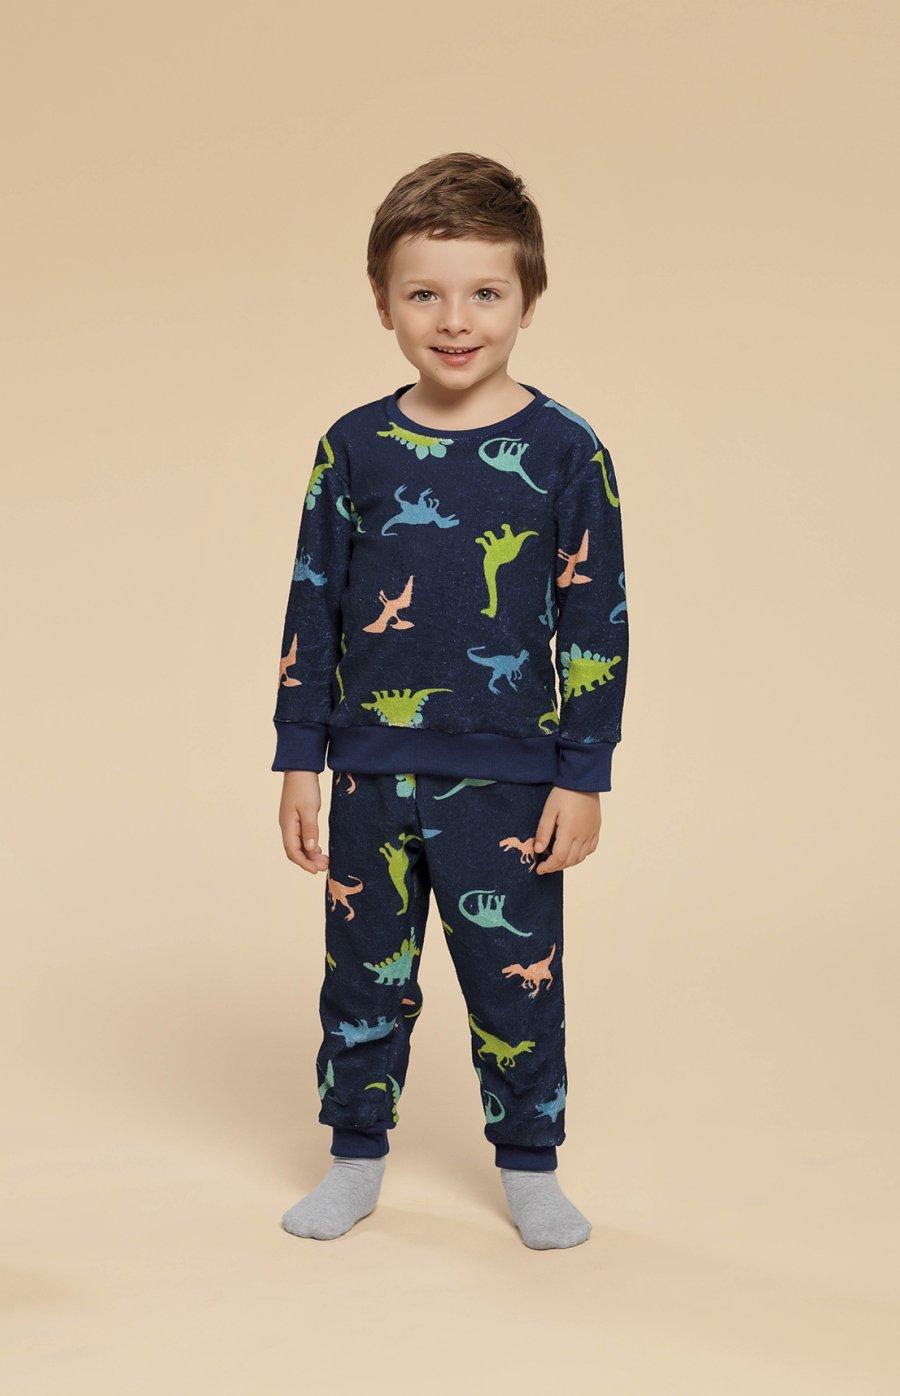 Pijama Baby Soft Dino Inverno 2019 PROMO